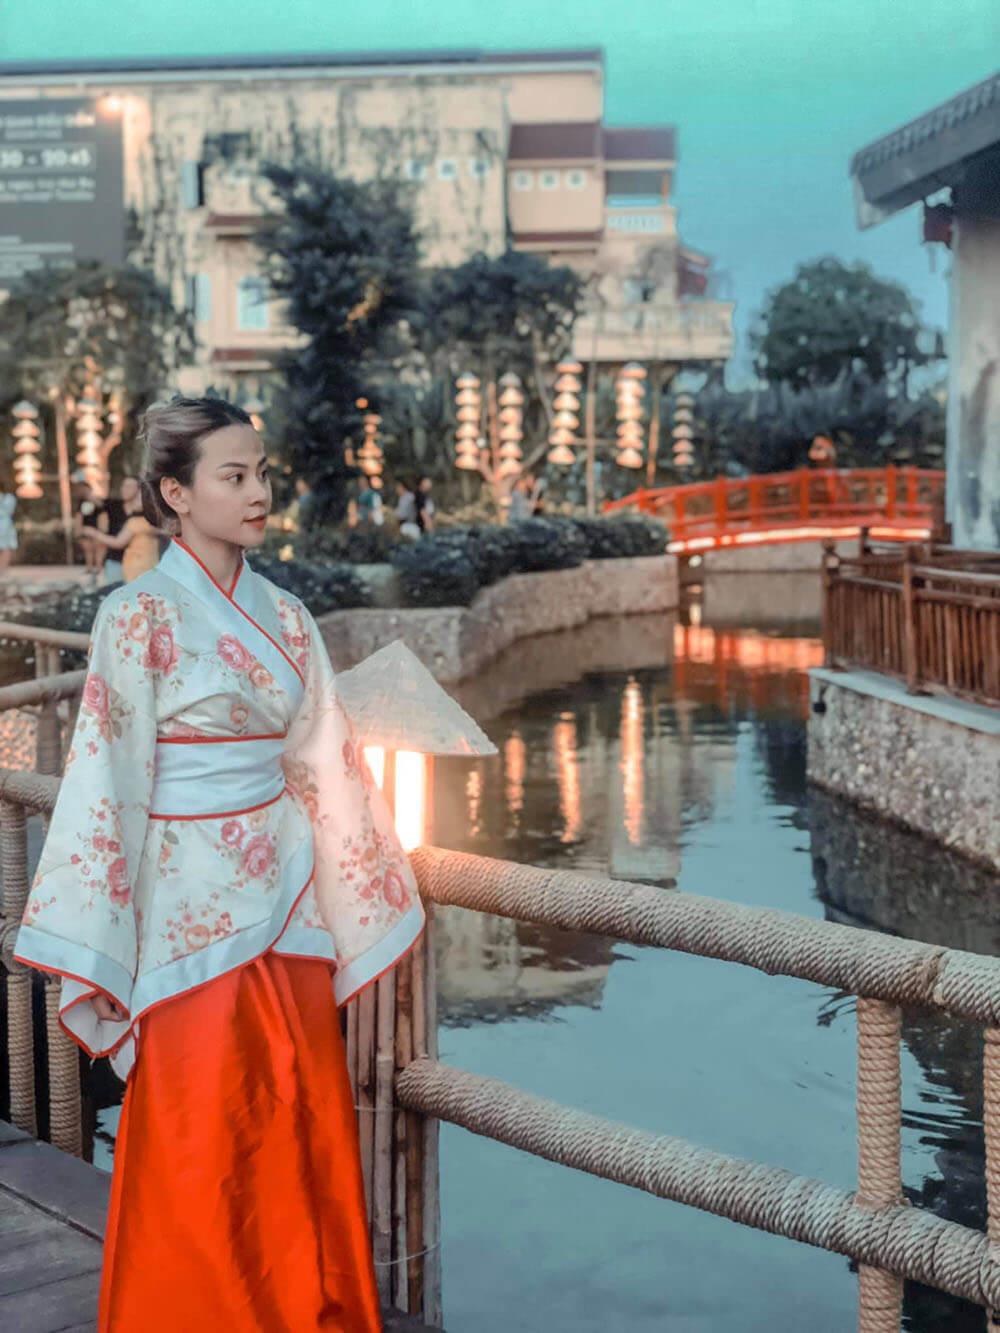 Cong Vien An Tuong Hoi An Show Dien Ky Uc Hoi An Review Kinh Nghiem Kham Pha Hoi An Chi Trong 1 Ngay Danang Fantasticity Com 07